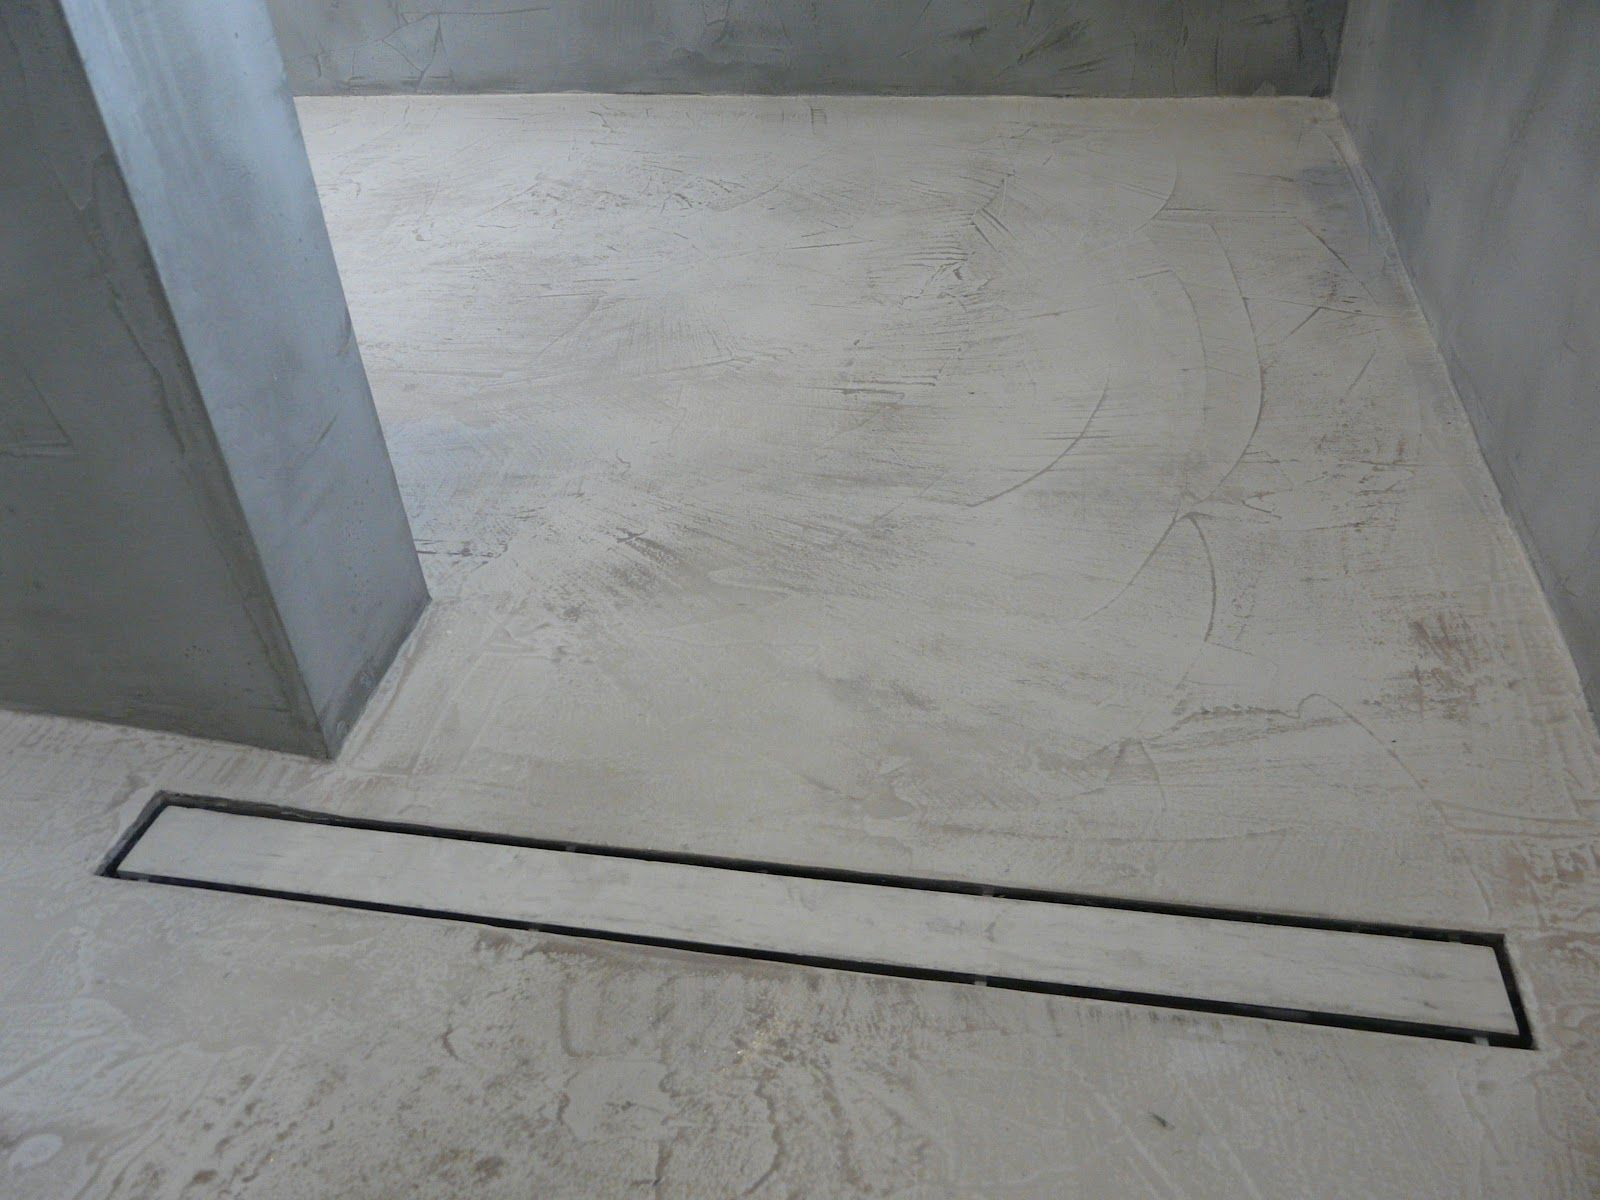 Wand wohndesign beton cire beton floor bodenbeschichtung in betonoptik badezimmer wc - Betonoptik wand bad ...